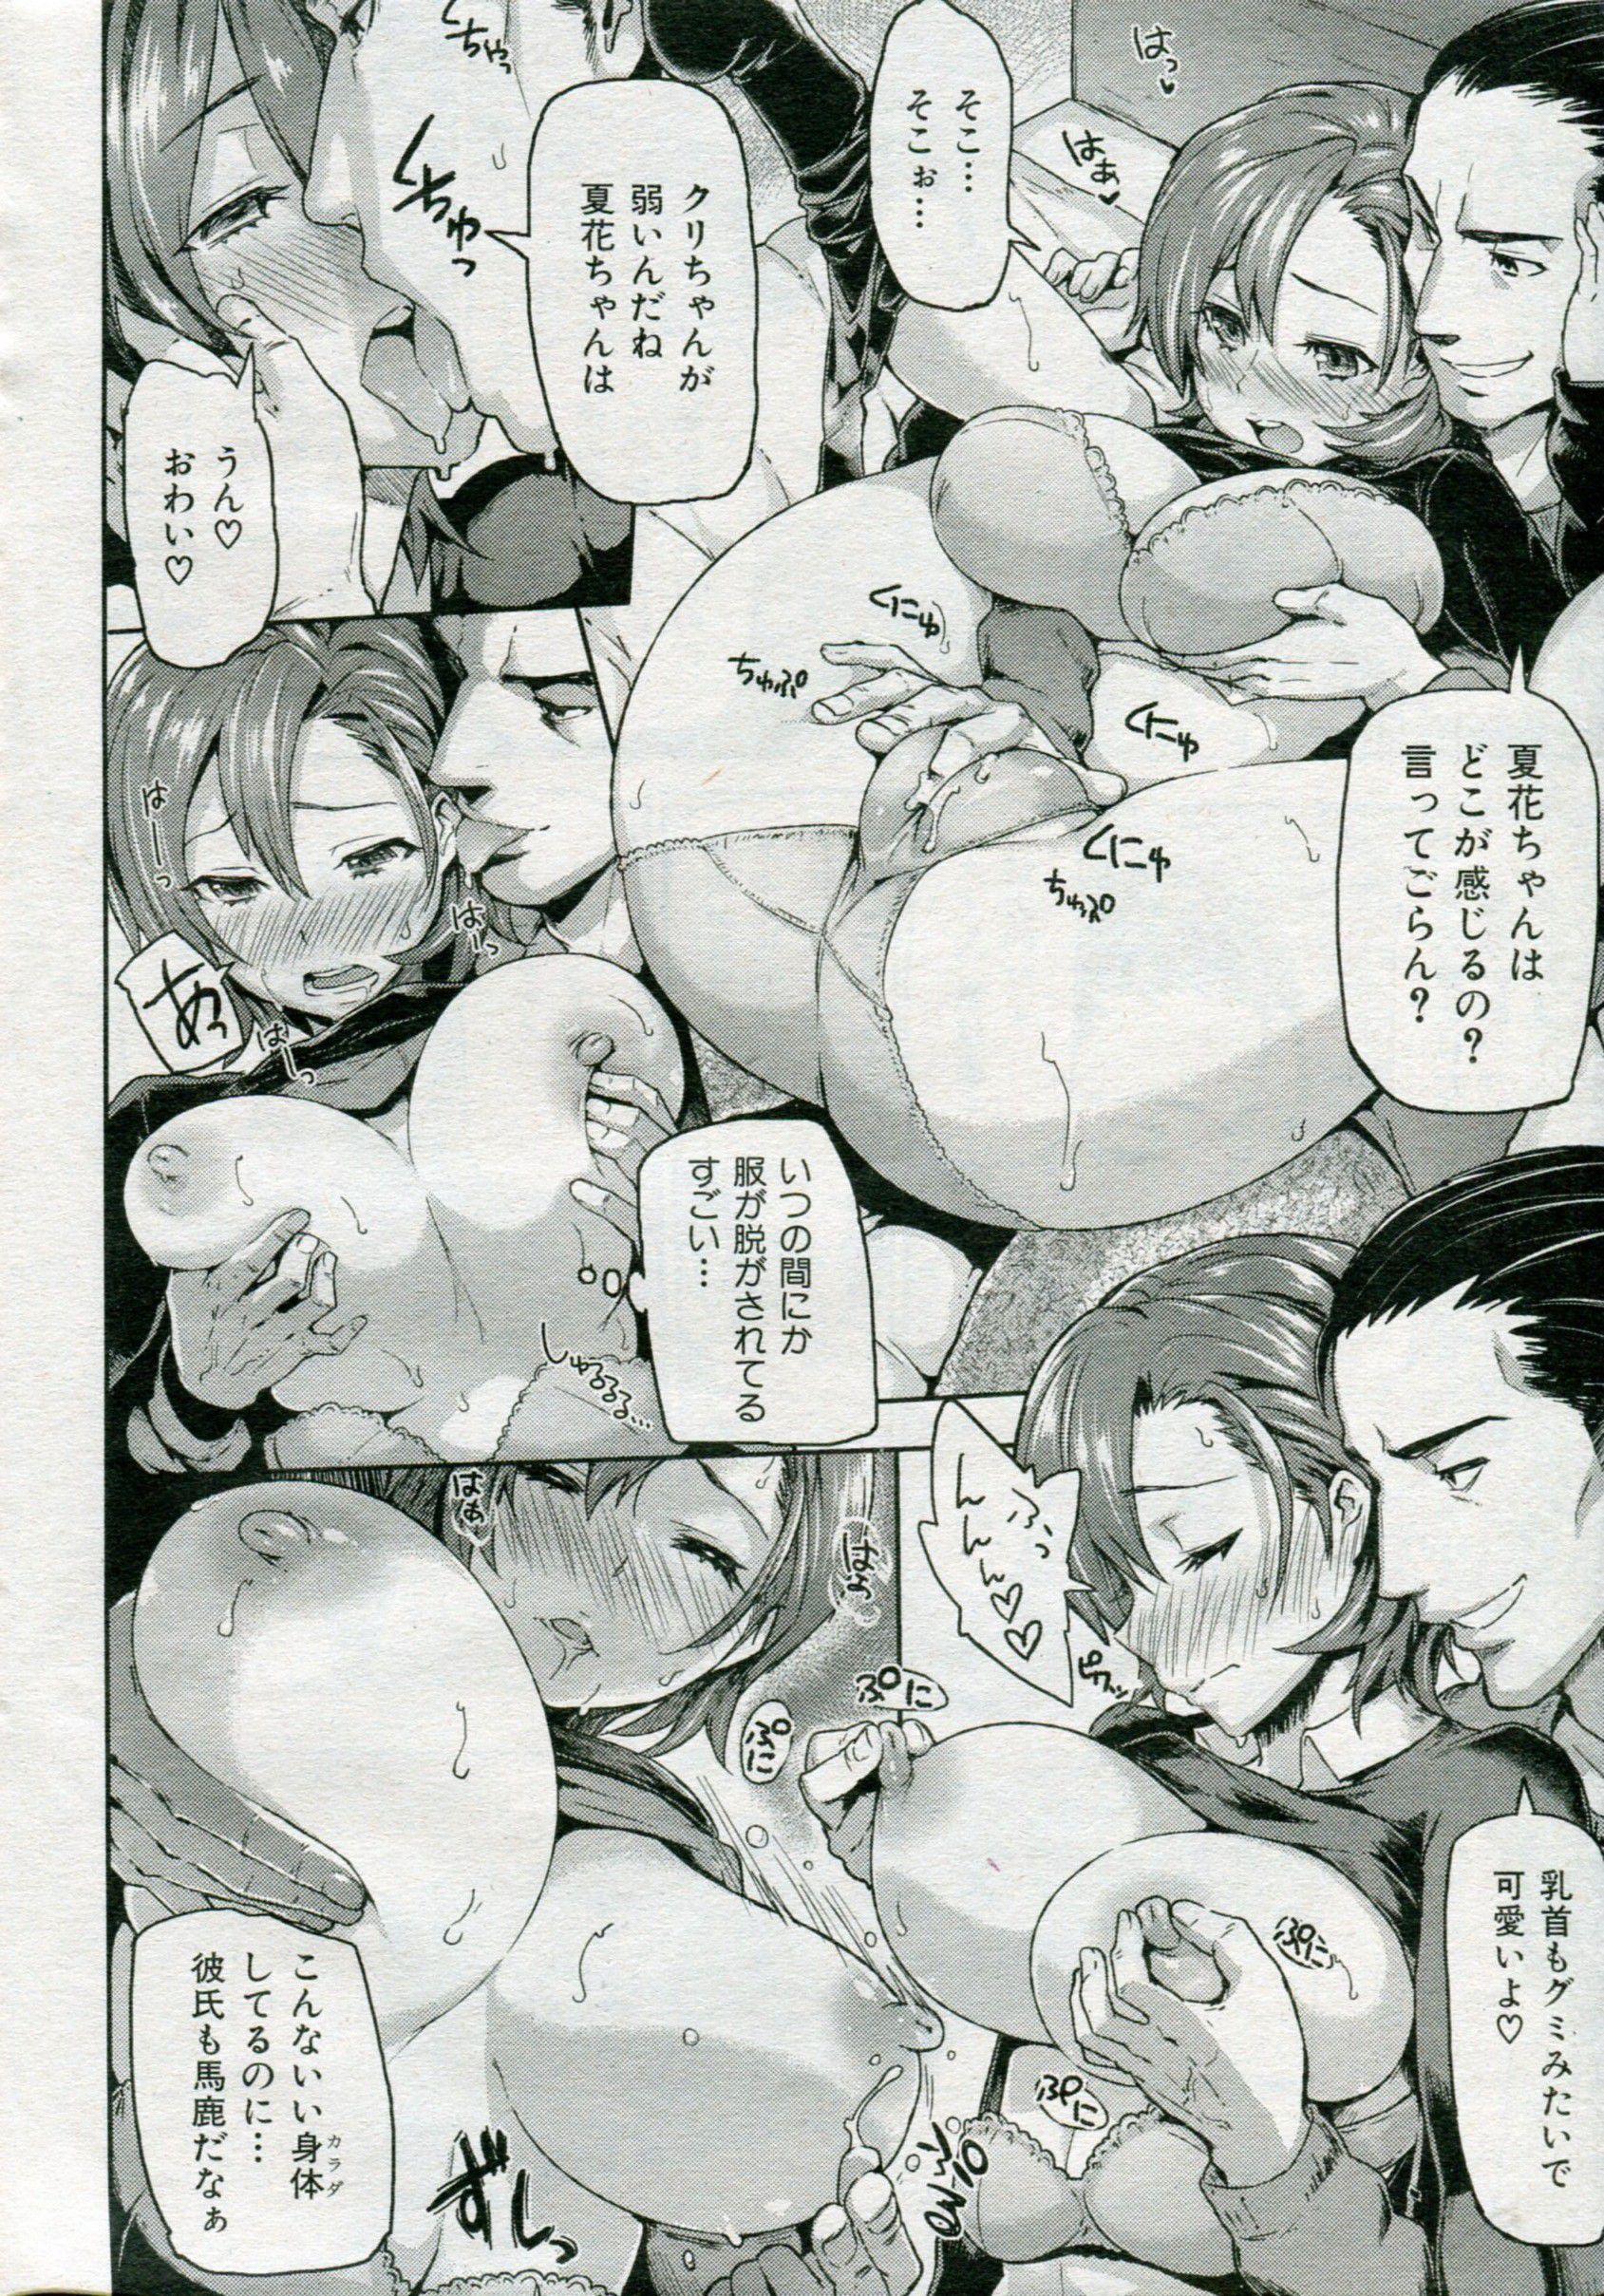 Meme 50 / DMMC / Memeya - Сборник хентай манги [Ptcen] [JAP,ENG] Manga Hentai